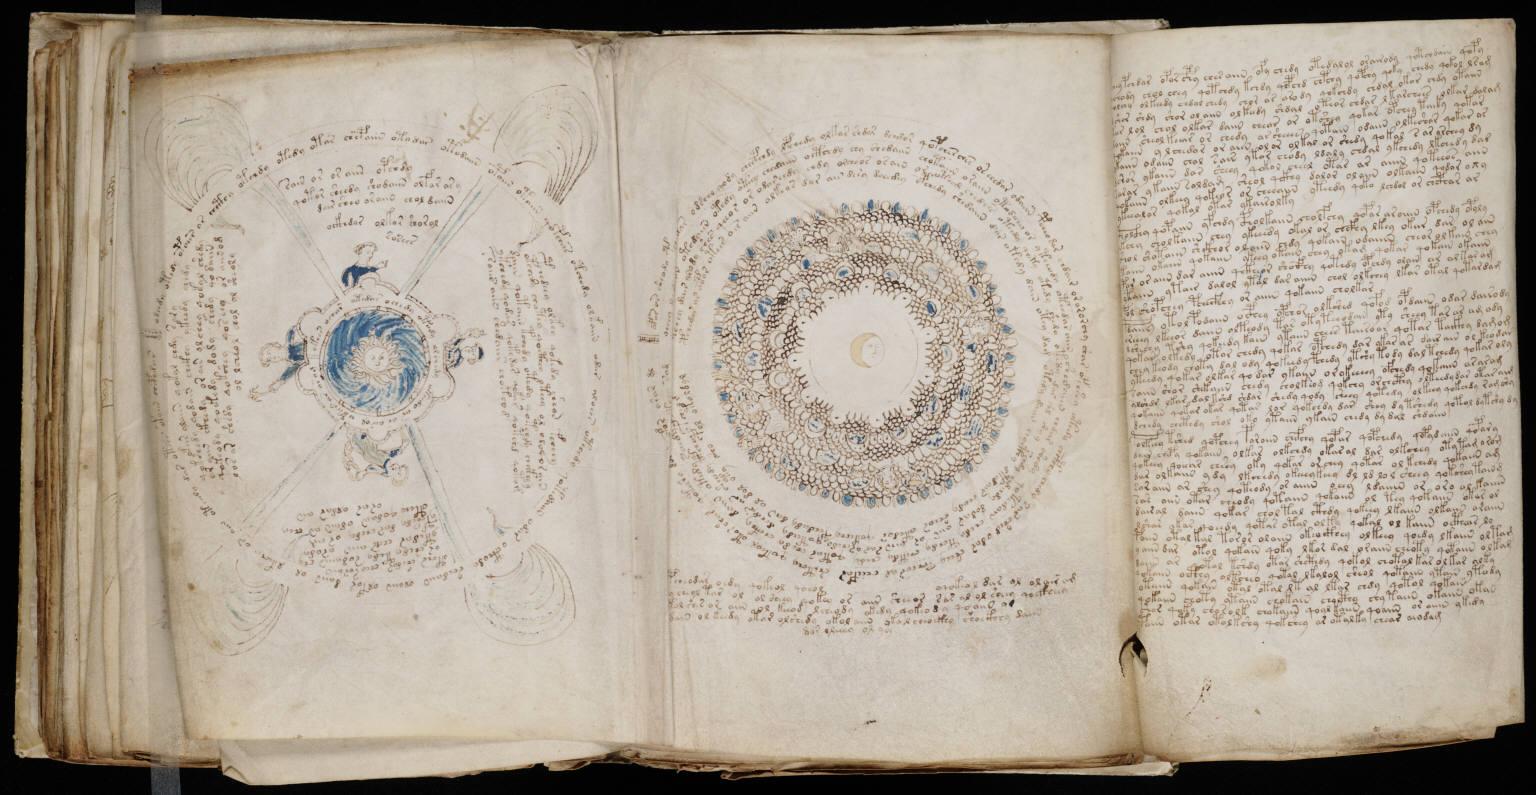 Voynich Manuscript %28156%29 ヴォイニッチ手稿(写本) どの言語にも属さない謎の文字!